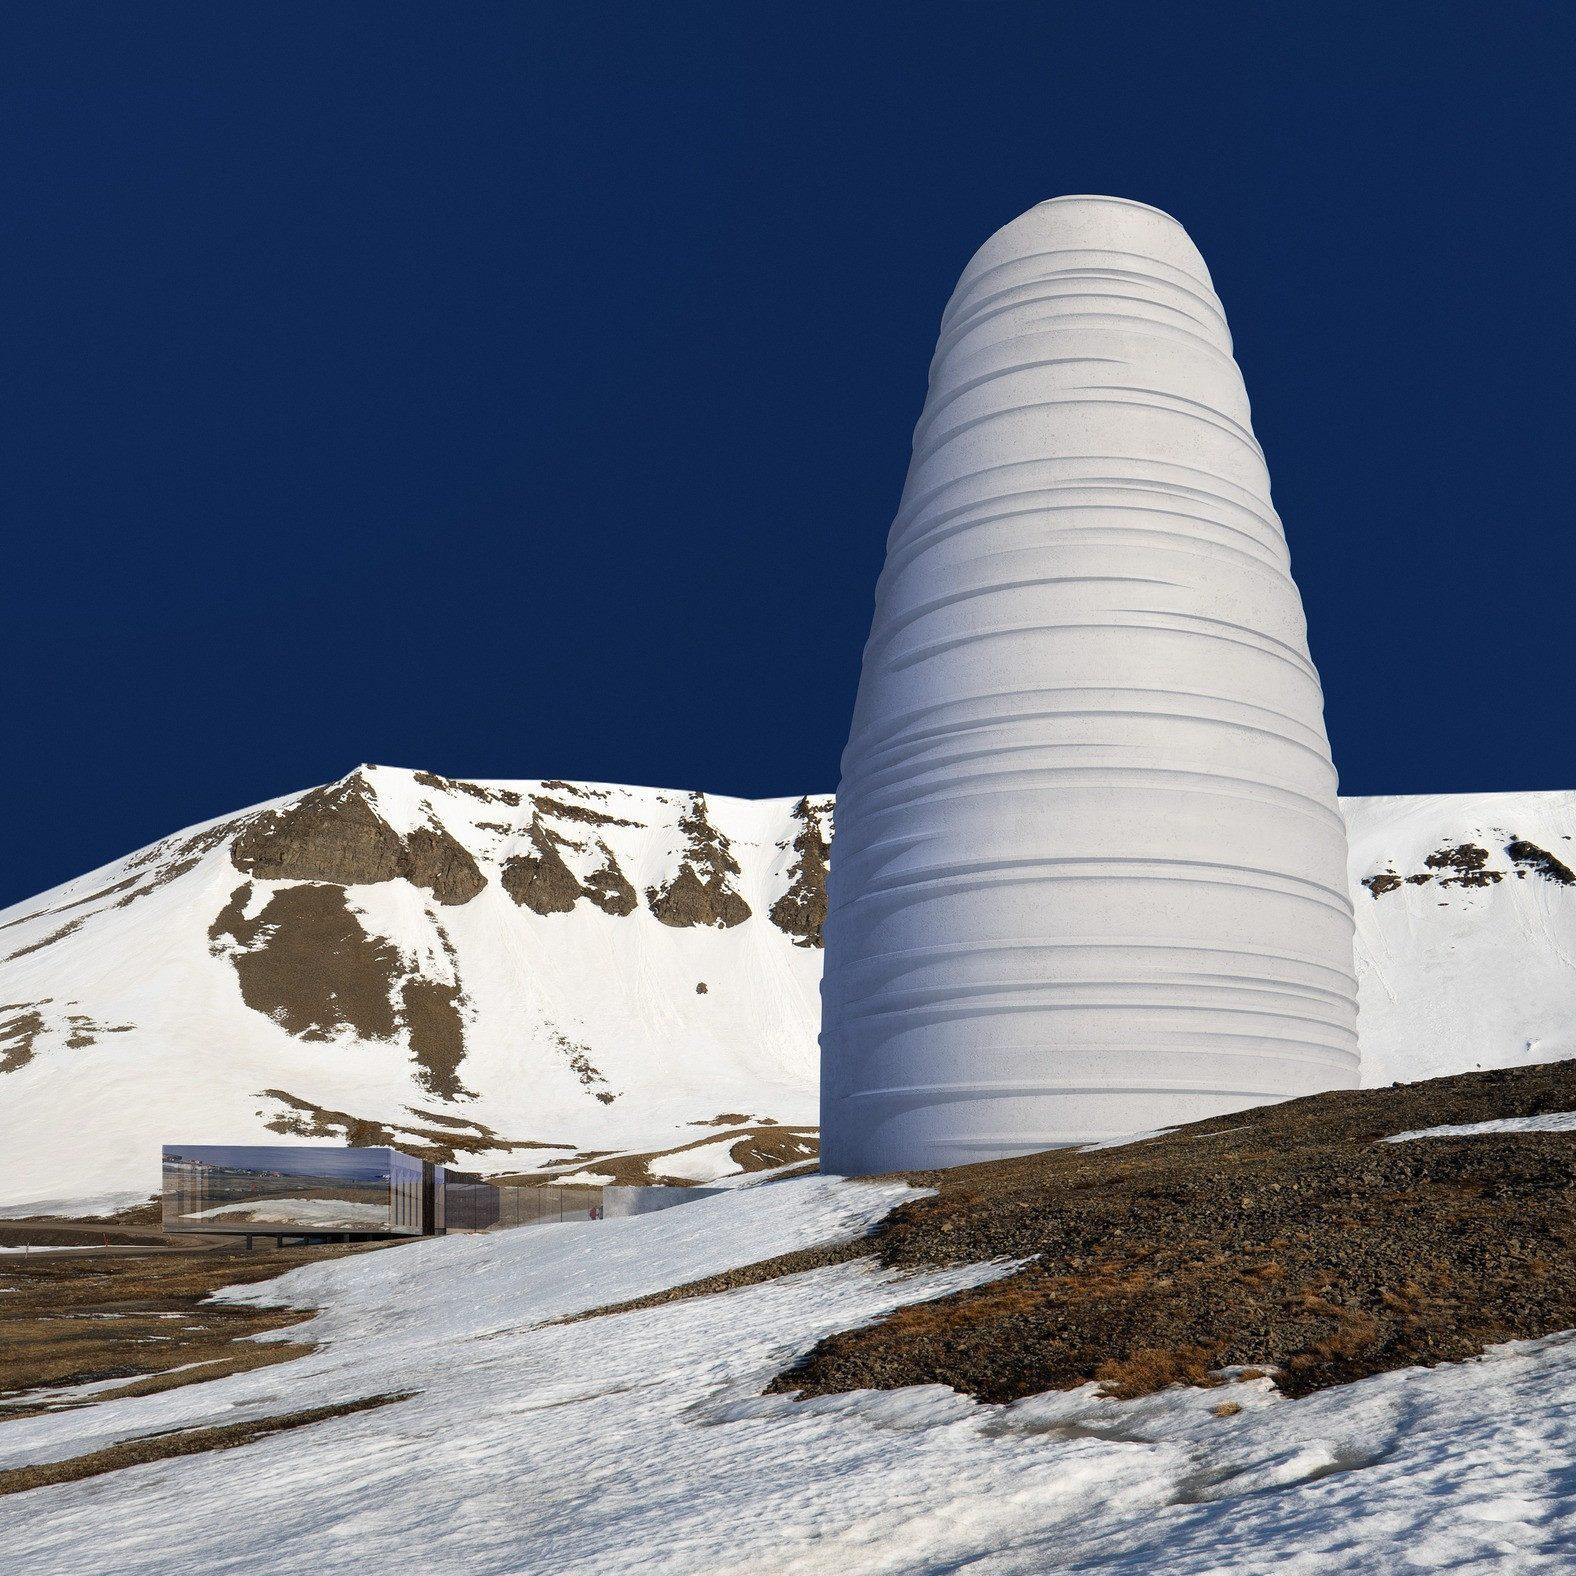 Svalbard S Doomsday Seed Vault To Get A Snohetta Designed